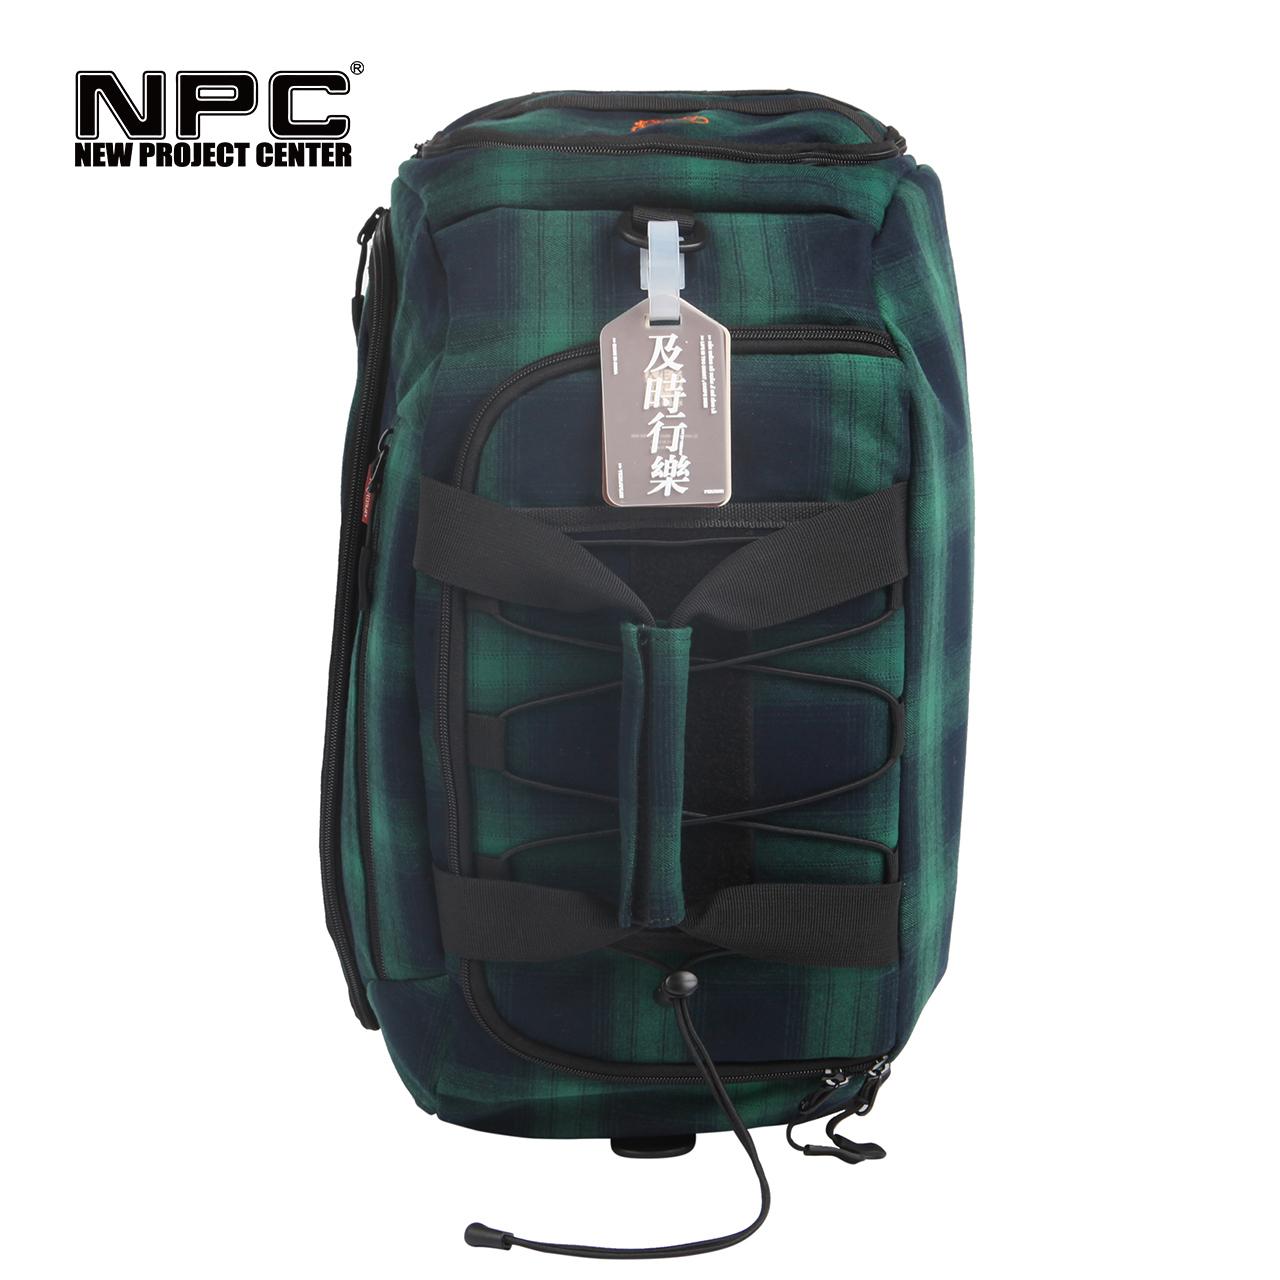 NPC潮牌YE3NJOY及时行乐旅行袋大容量绿色格子背包登山包双肩户外